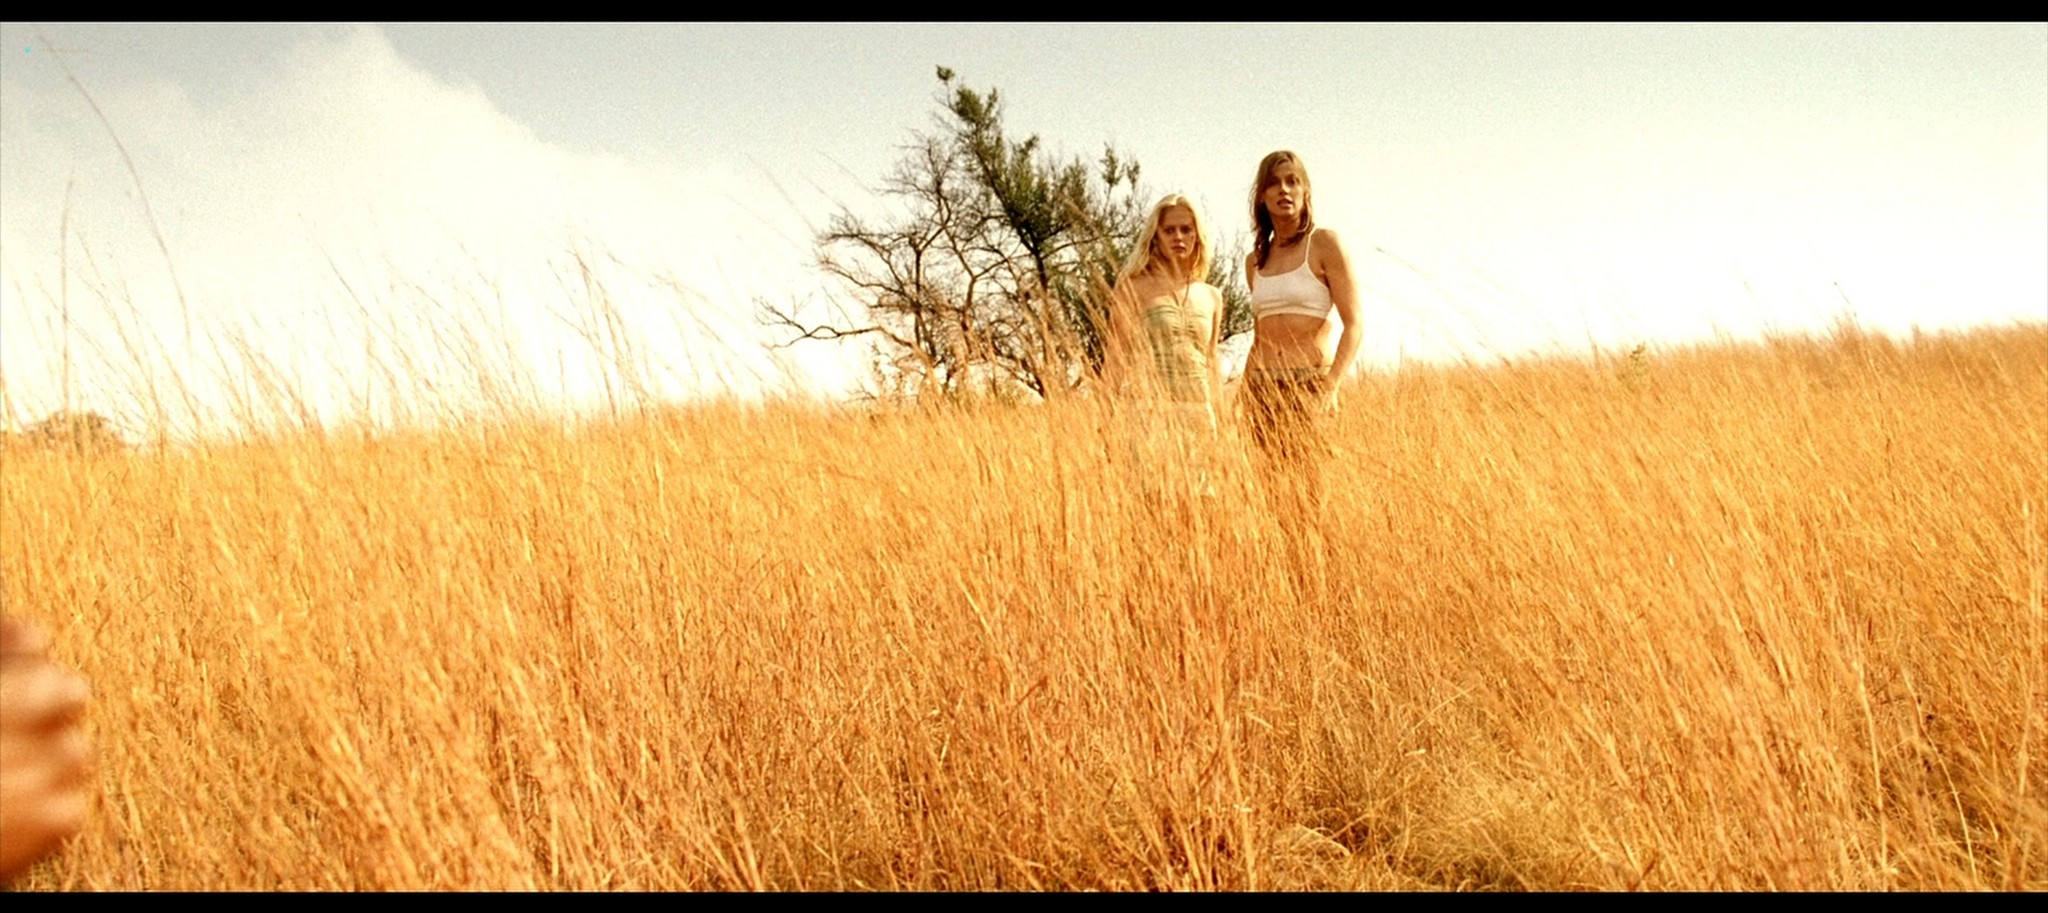 Bridget Moynahan hot and sexy Prey 2007 1080p BluRay REMUX 10